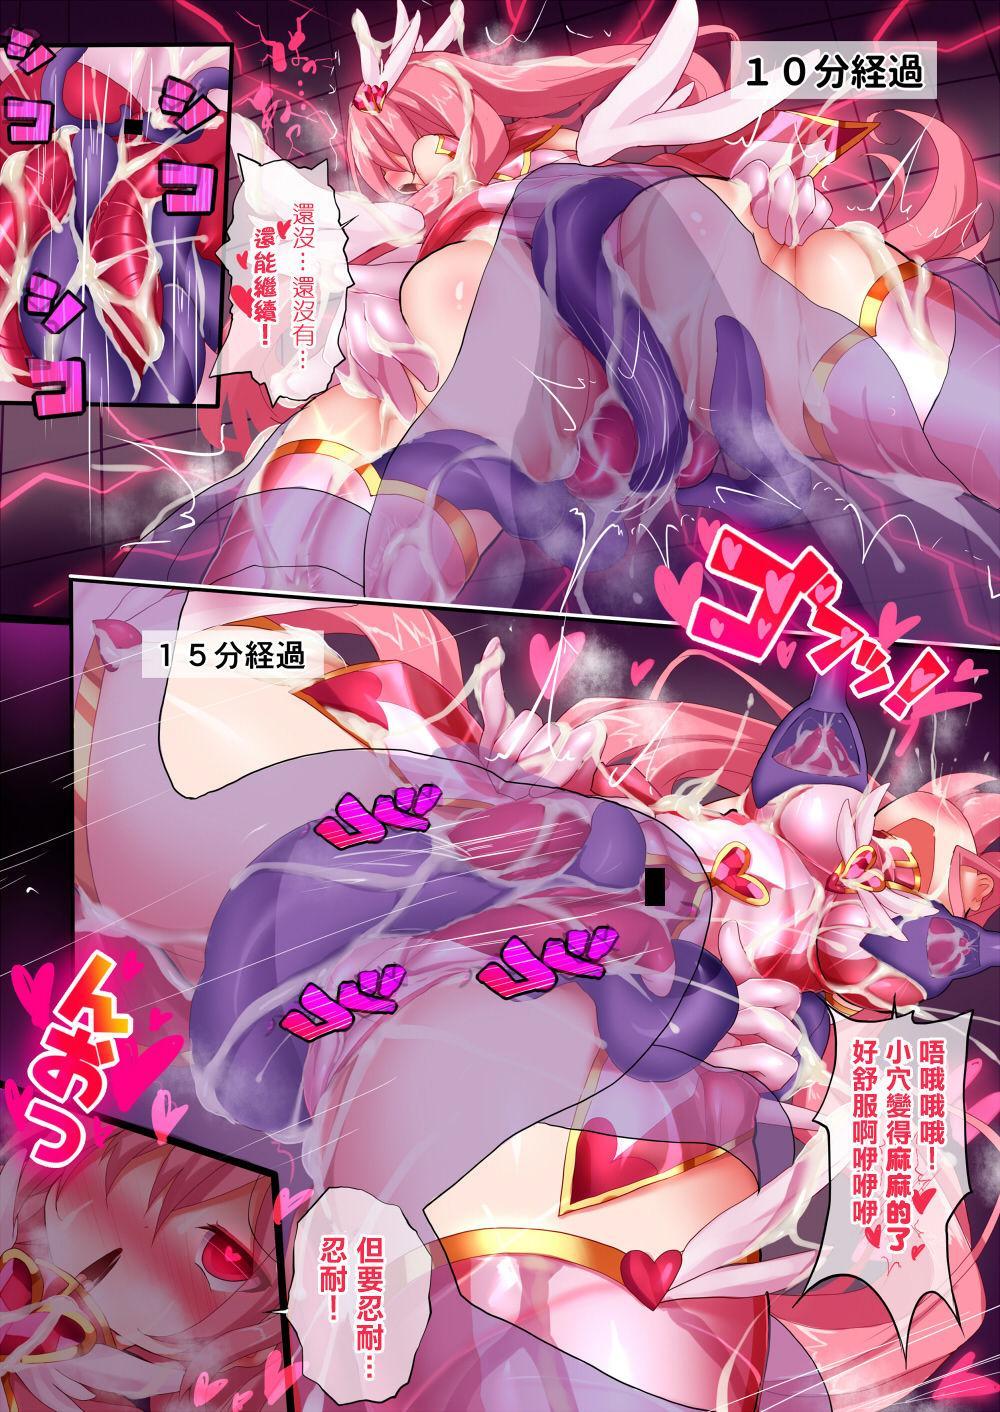 [Makutsutei (Nagai Wataru)] Orgasm Unit EX -Mahou Senshi Akari Ch. 1-2 [Chinese] [这很恶堕 x Lolipoi汉化组] 17